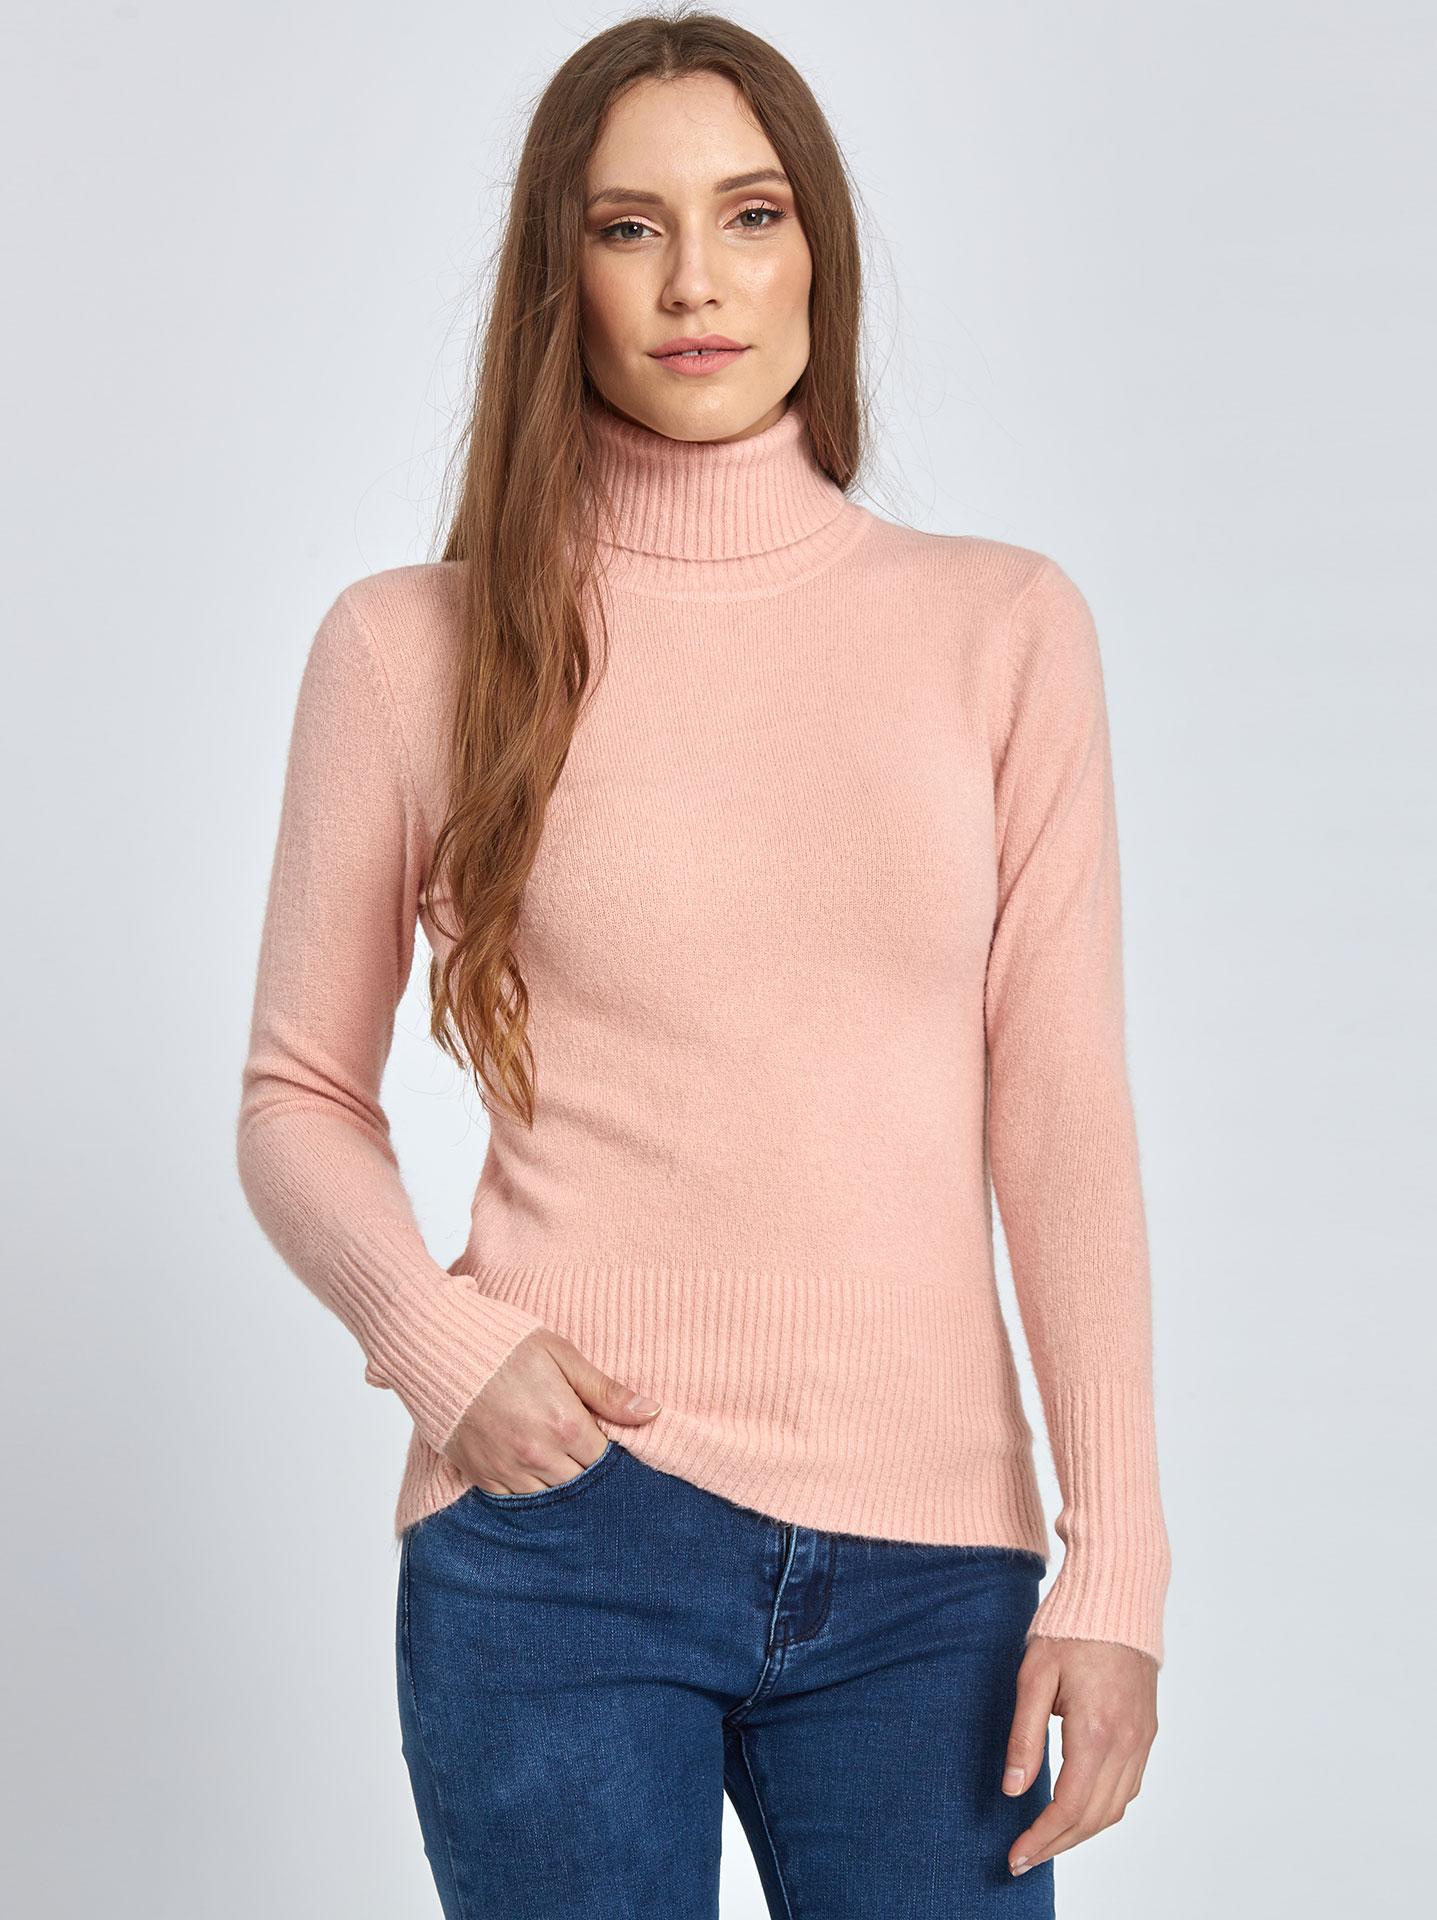 bc6218b6b5e9 Ζιβάγκο πουλόβερ σε ροζ